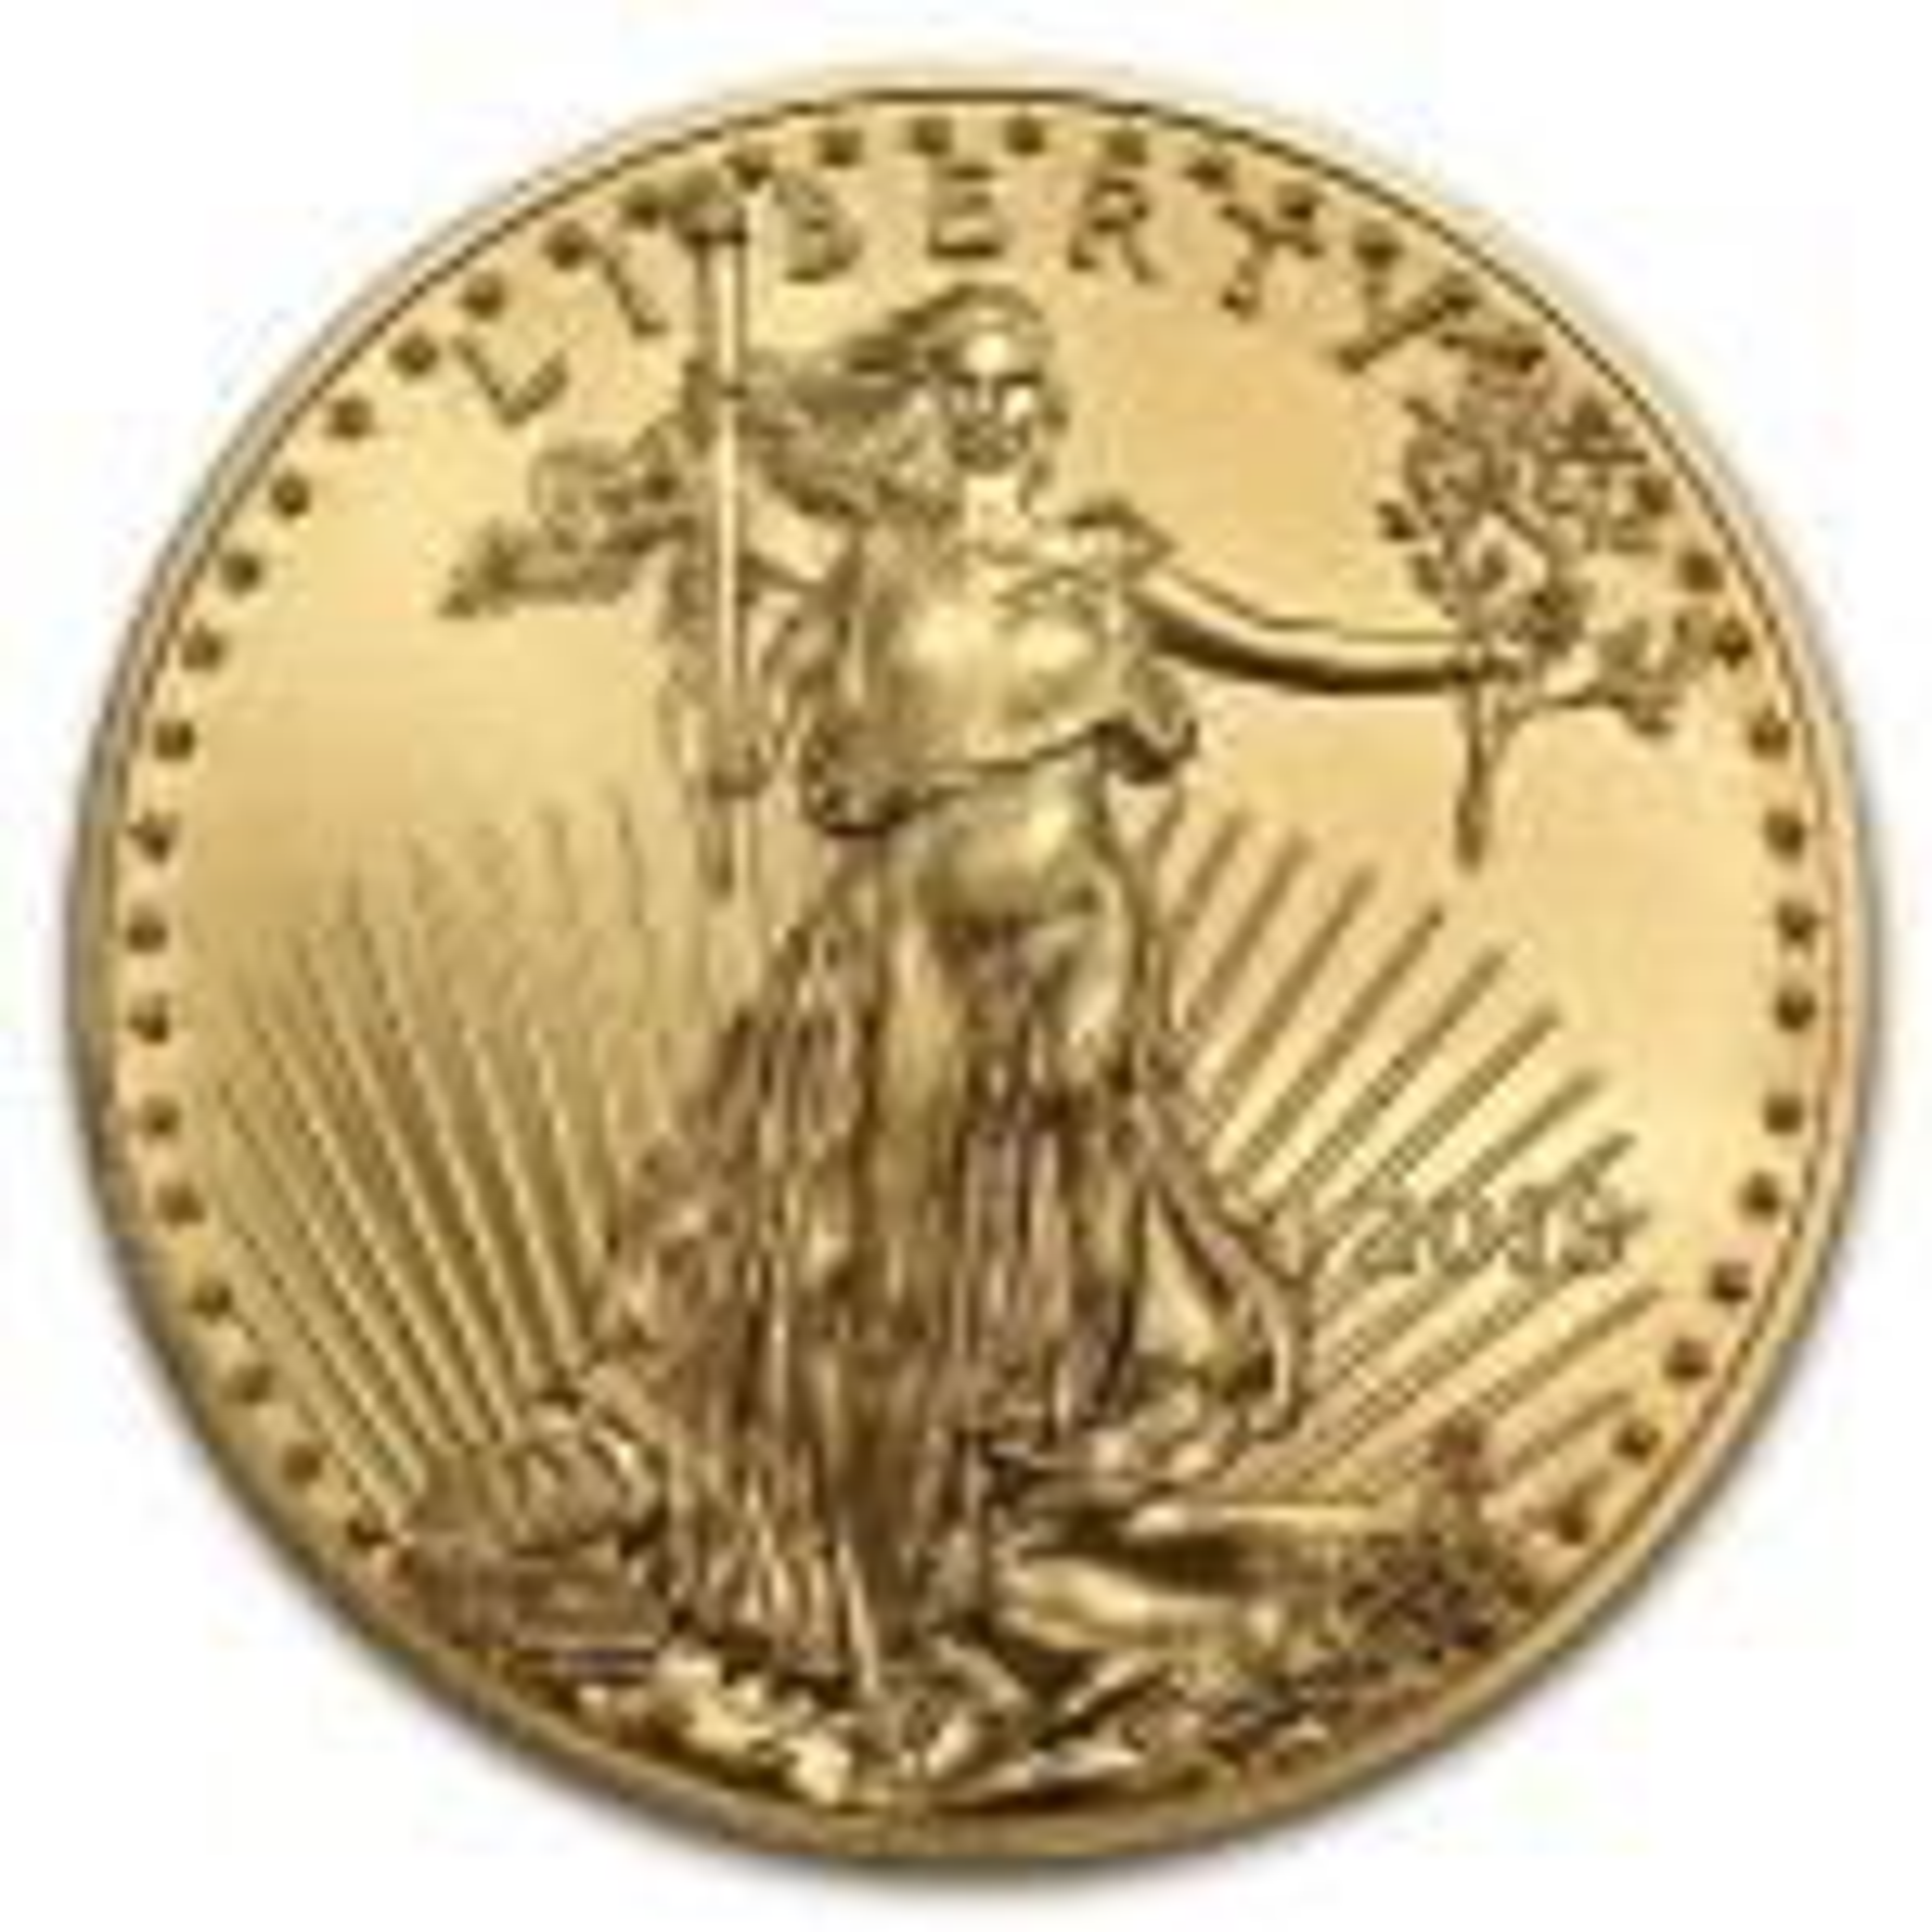 Gold Eagle 1/2 troy ounce coin 2018